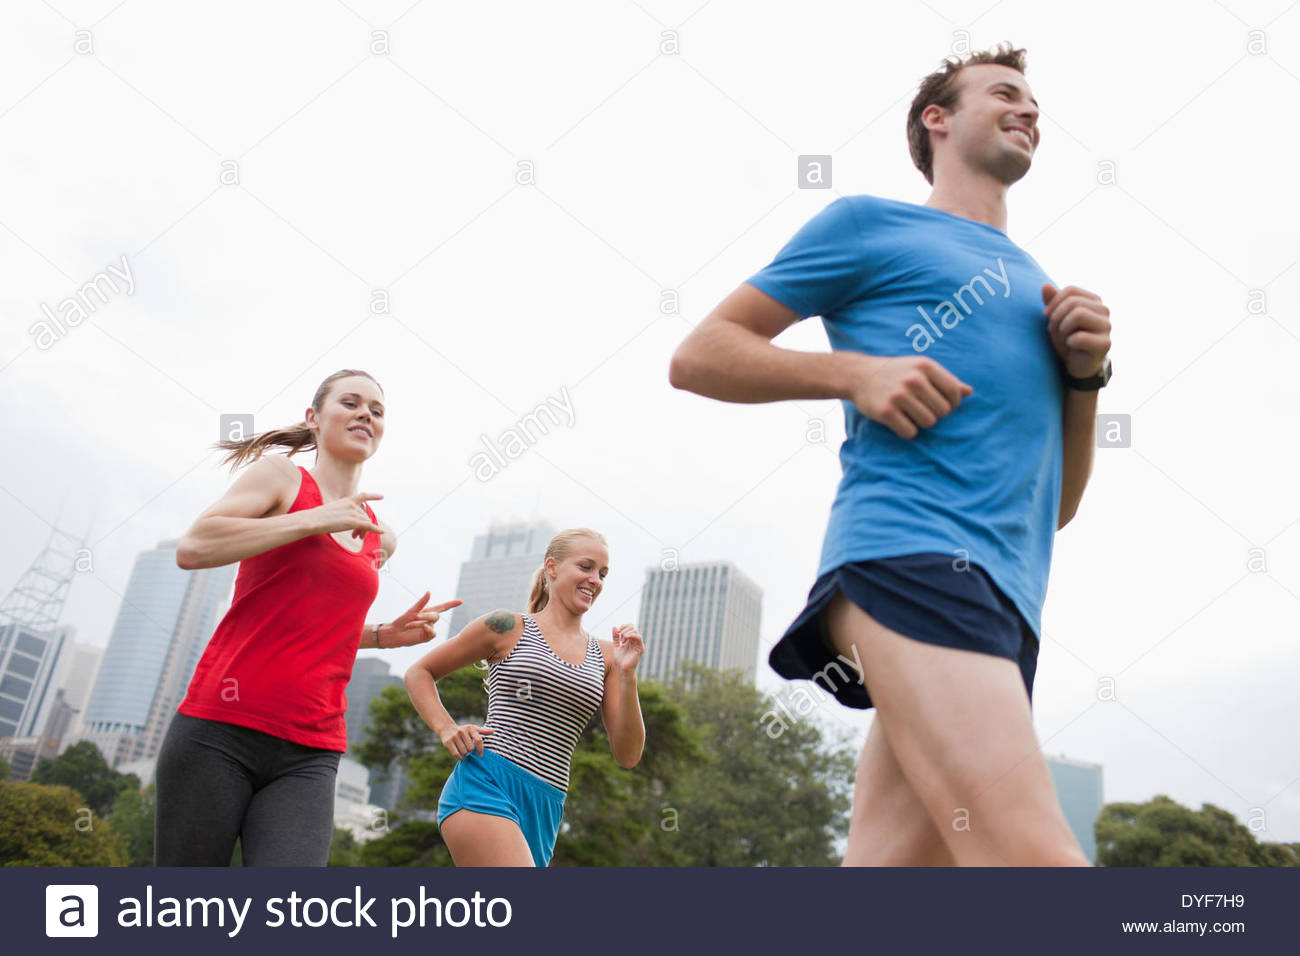 Friends running in urban park - Stock Image